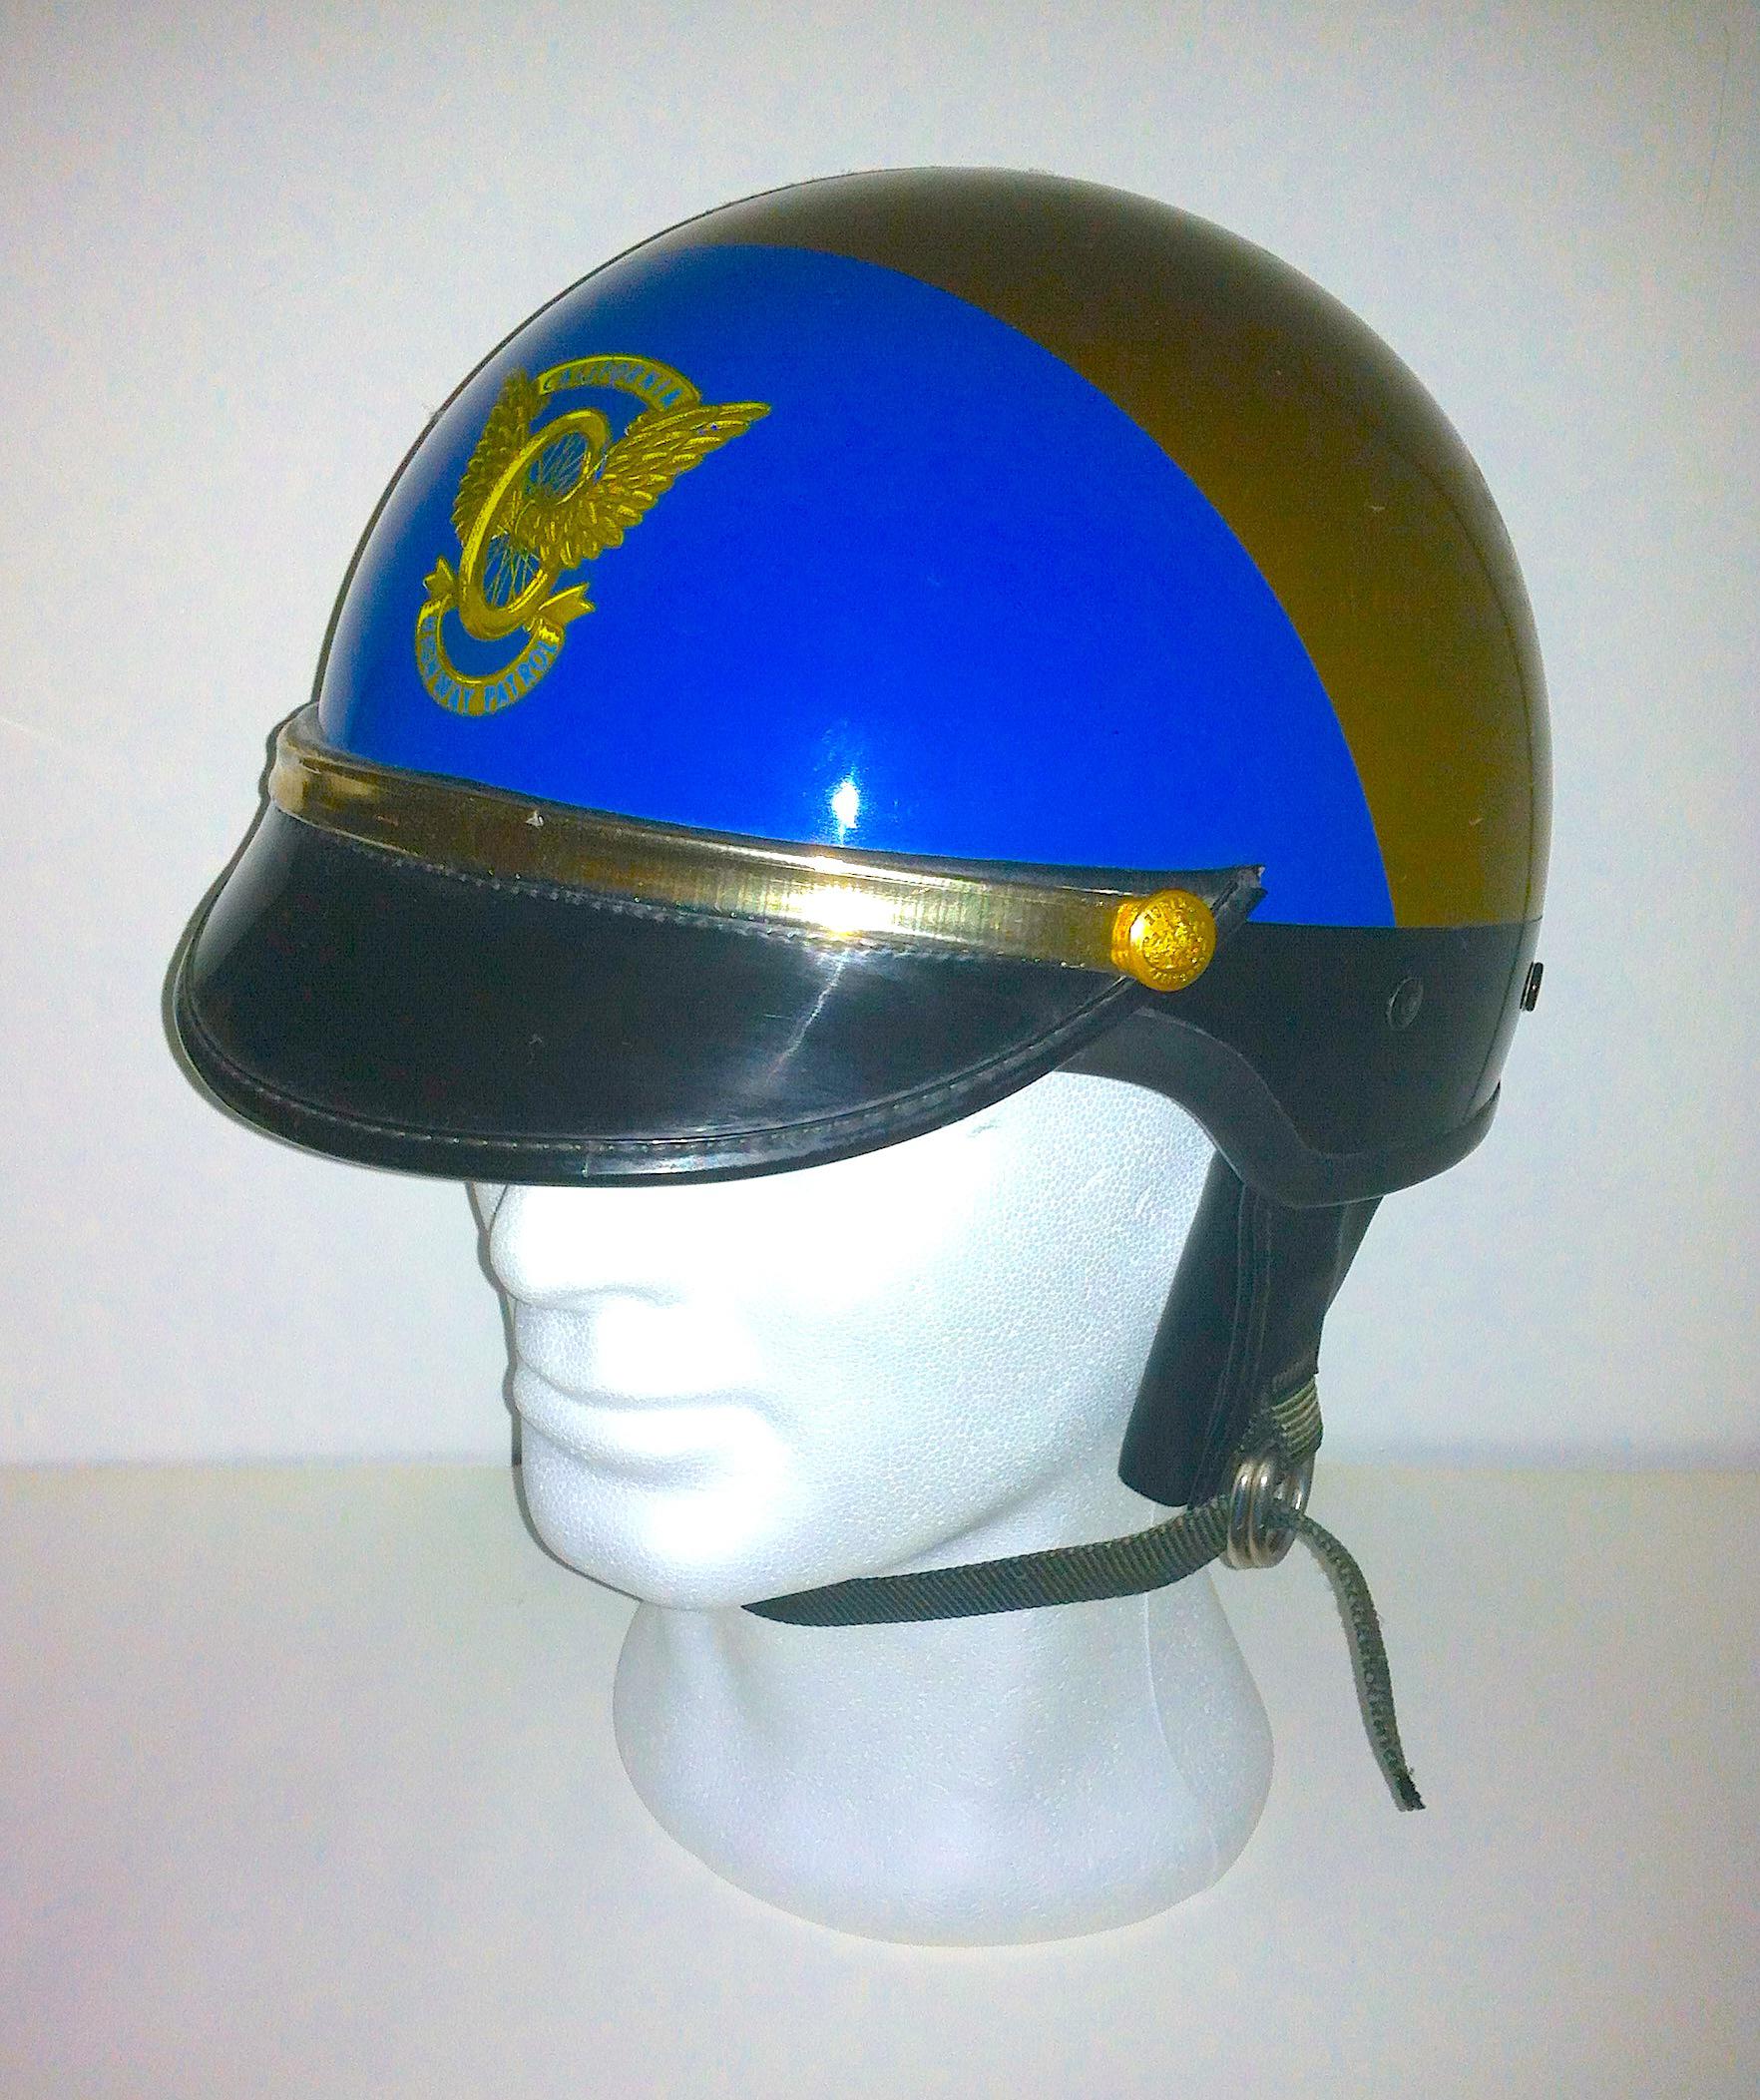 file chp 70 u0027s helmet jpg wikimedia commons